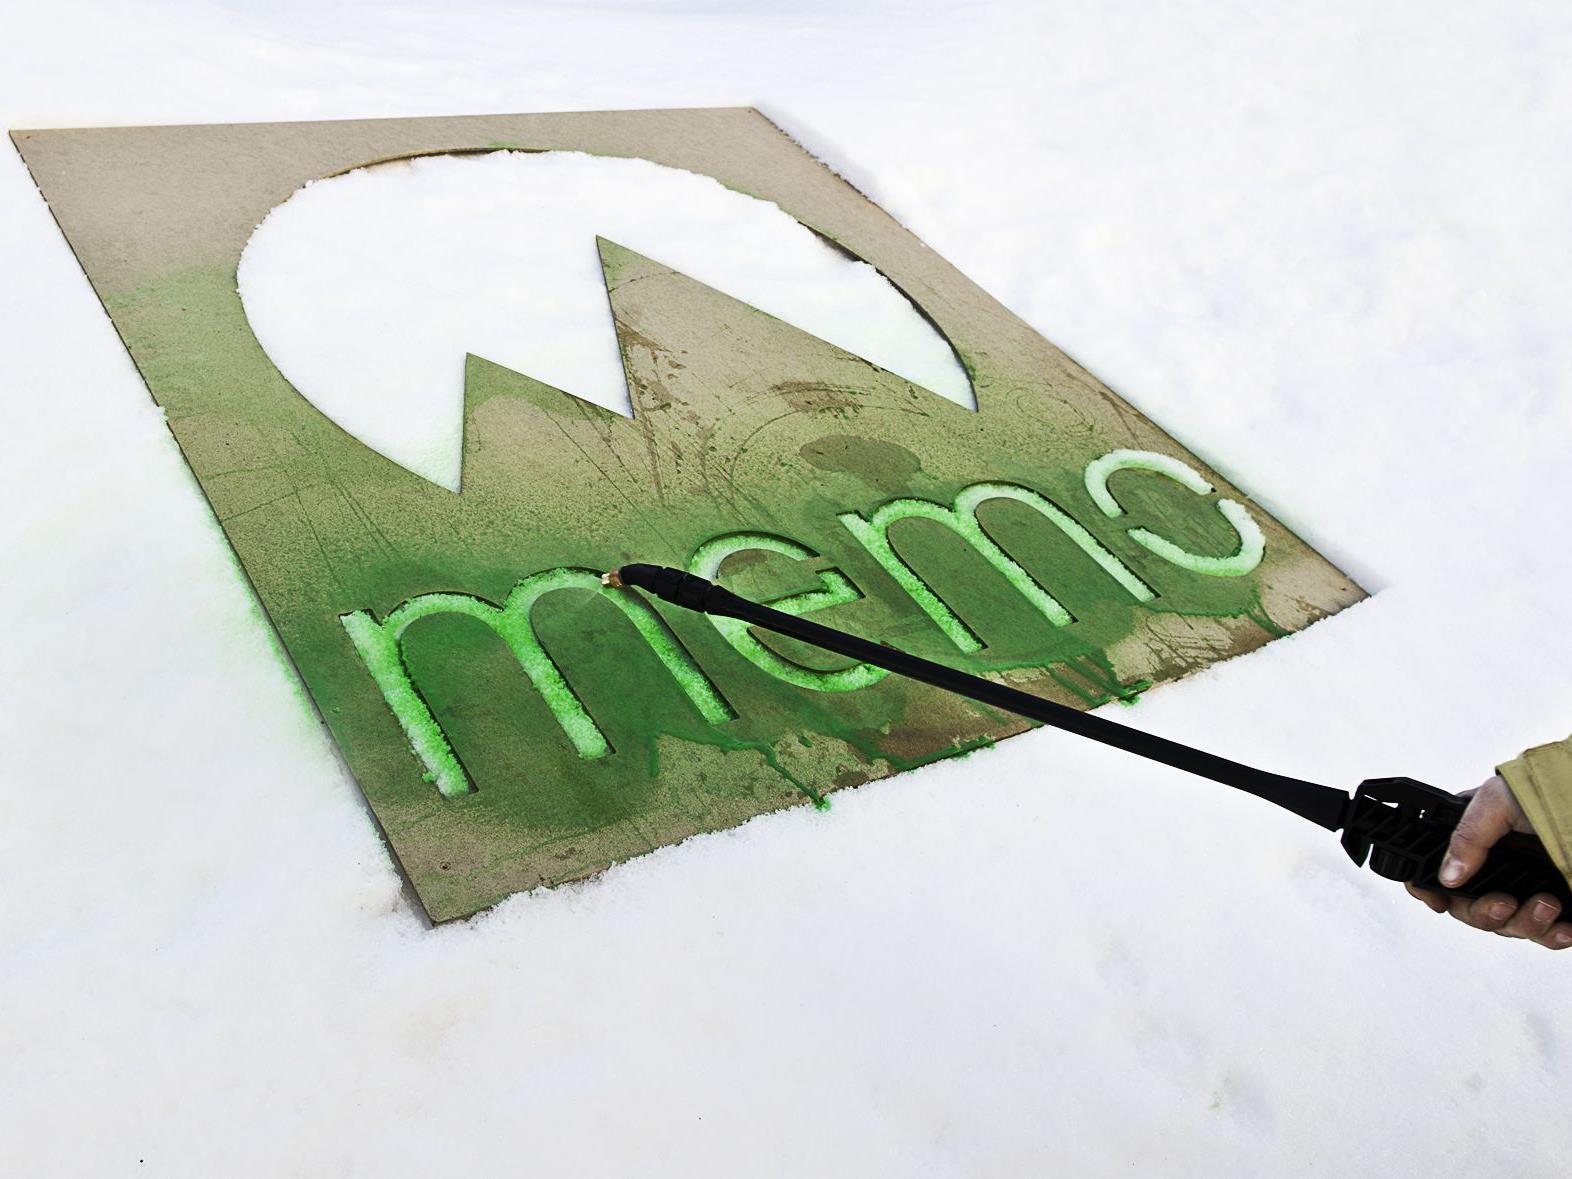 Snowbrading im Montafon